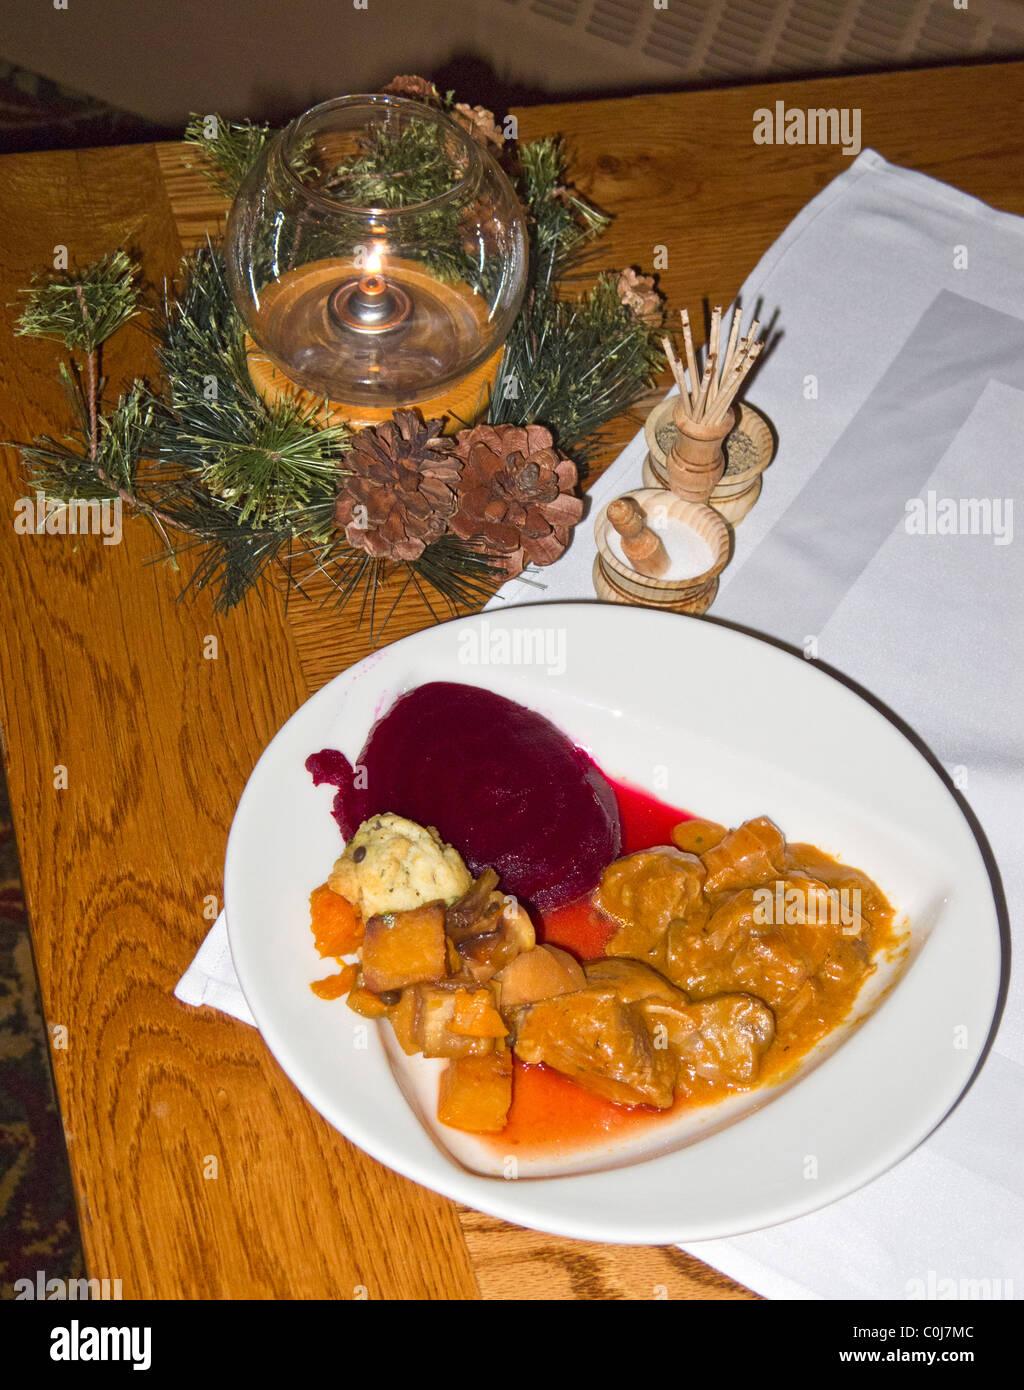 Pork stew at Fireside Dining dinner, Deer Valley, Utah - Stock Image